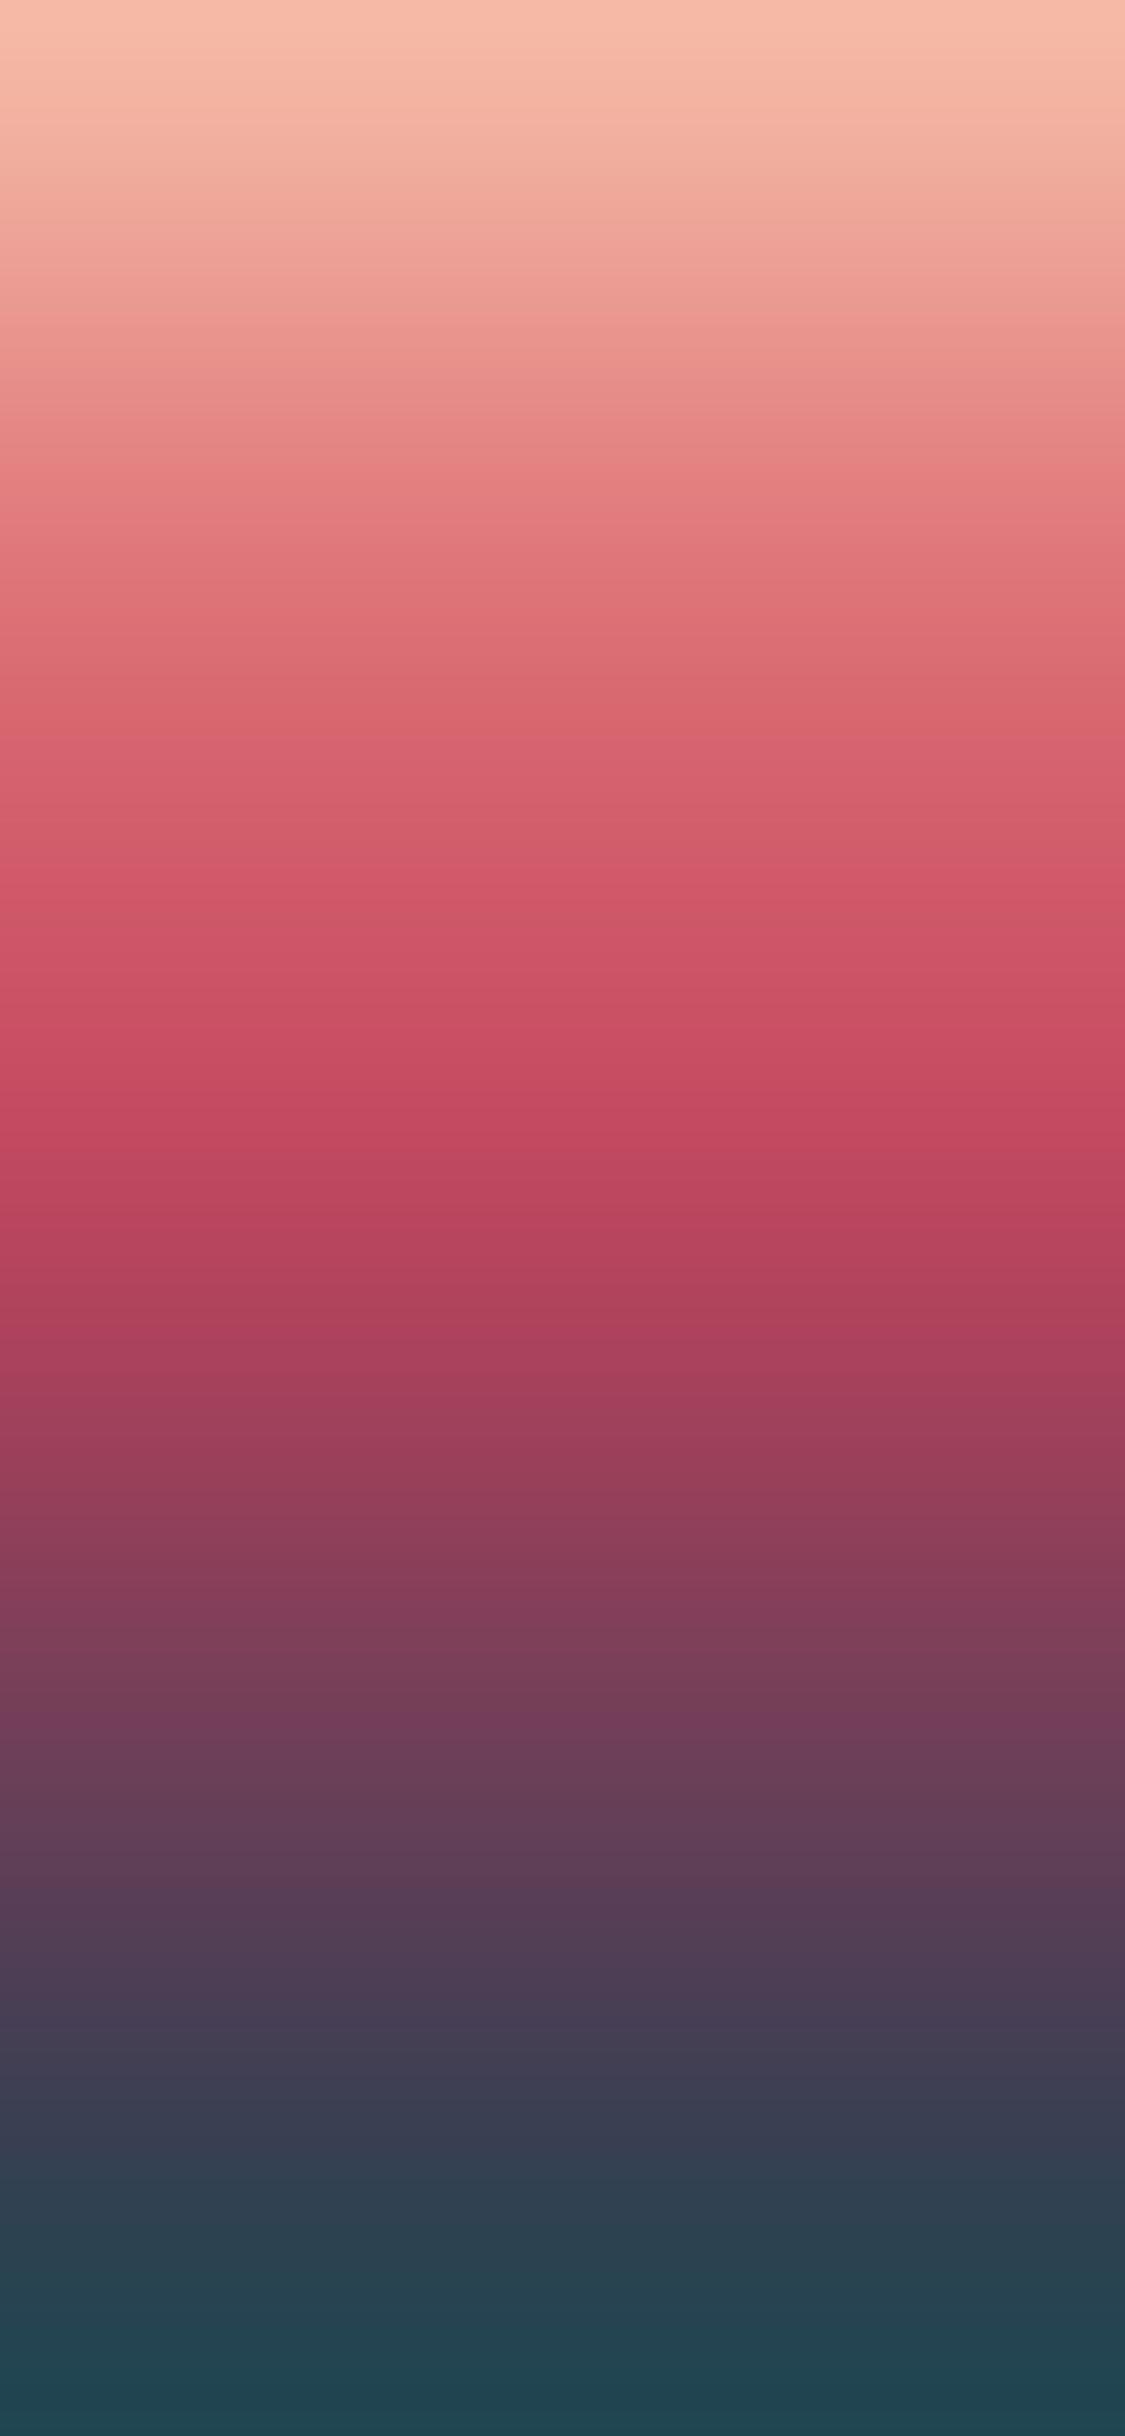 iPhoneXpapers.com-Apple-iPhone-wallpaper-sl27-red-orange-blur-gradation